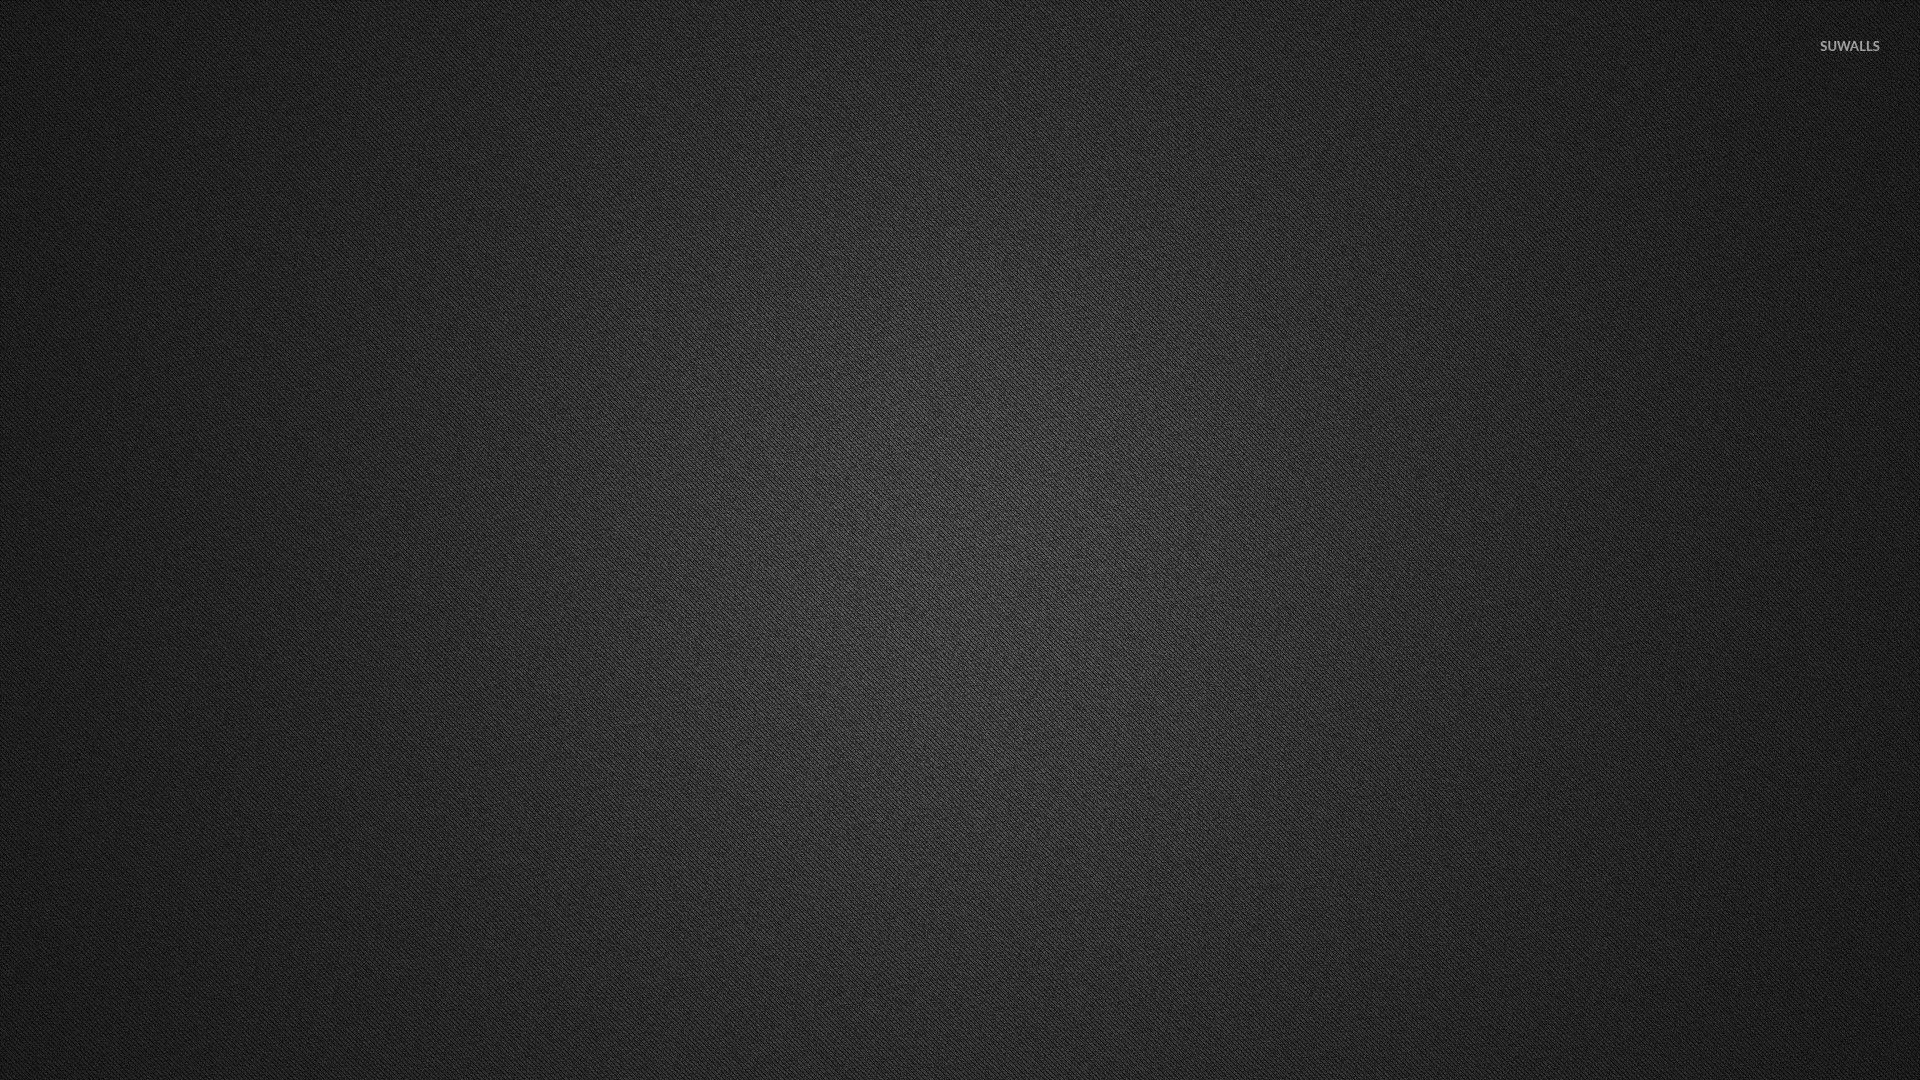 grey textured wallpaper - photo #6